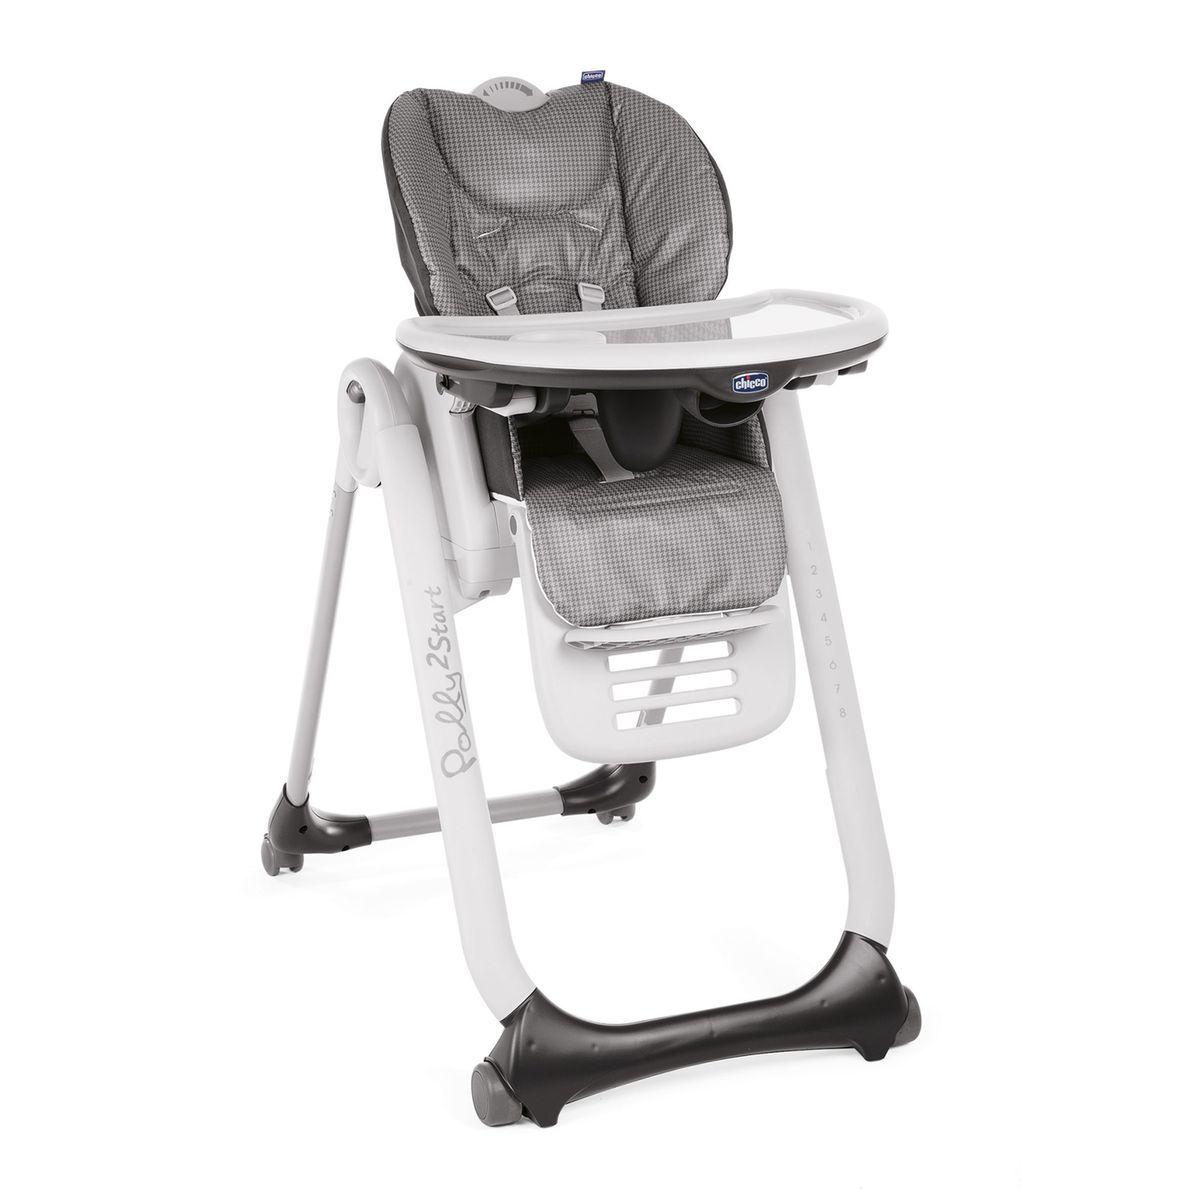 Chaise Haute Polly 2 Start En 2020 Chaise Haute Chaise Haute Bebe Chaise Enfant